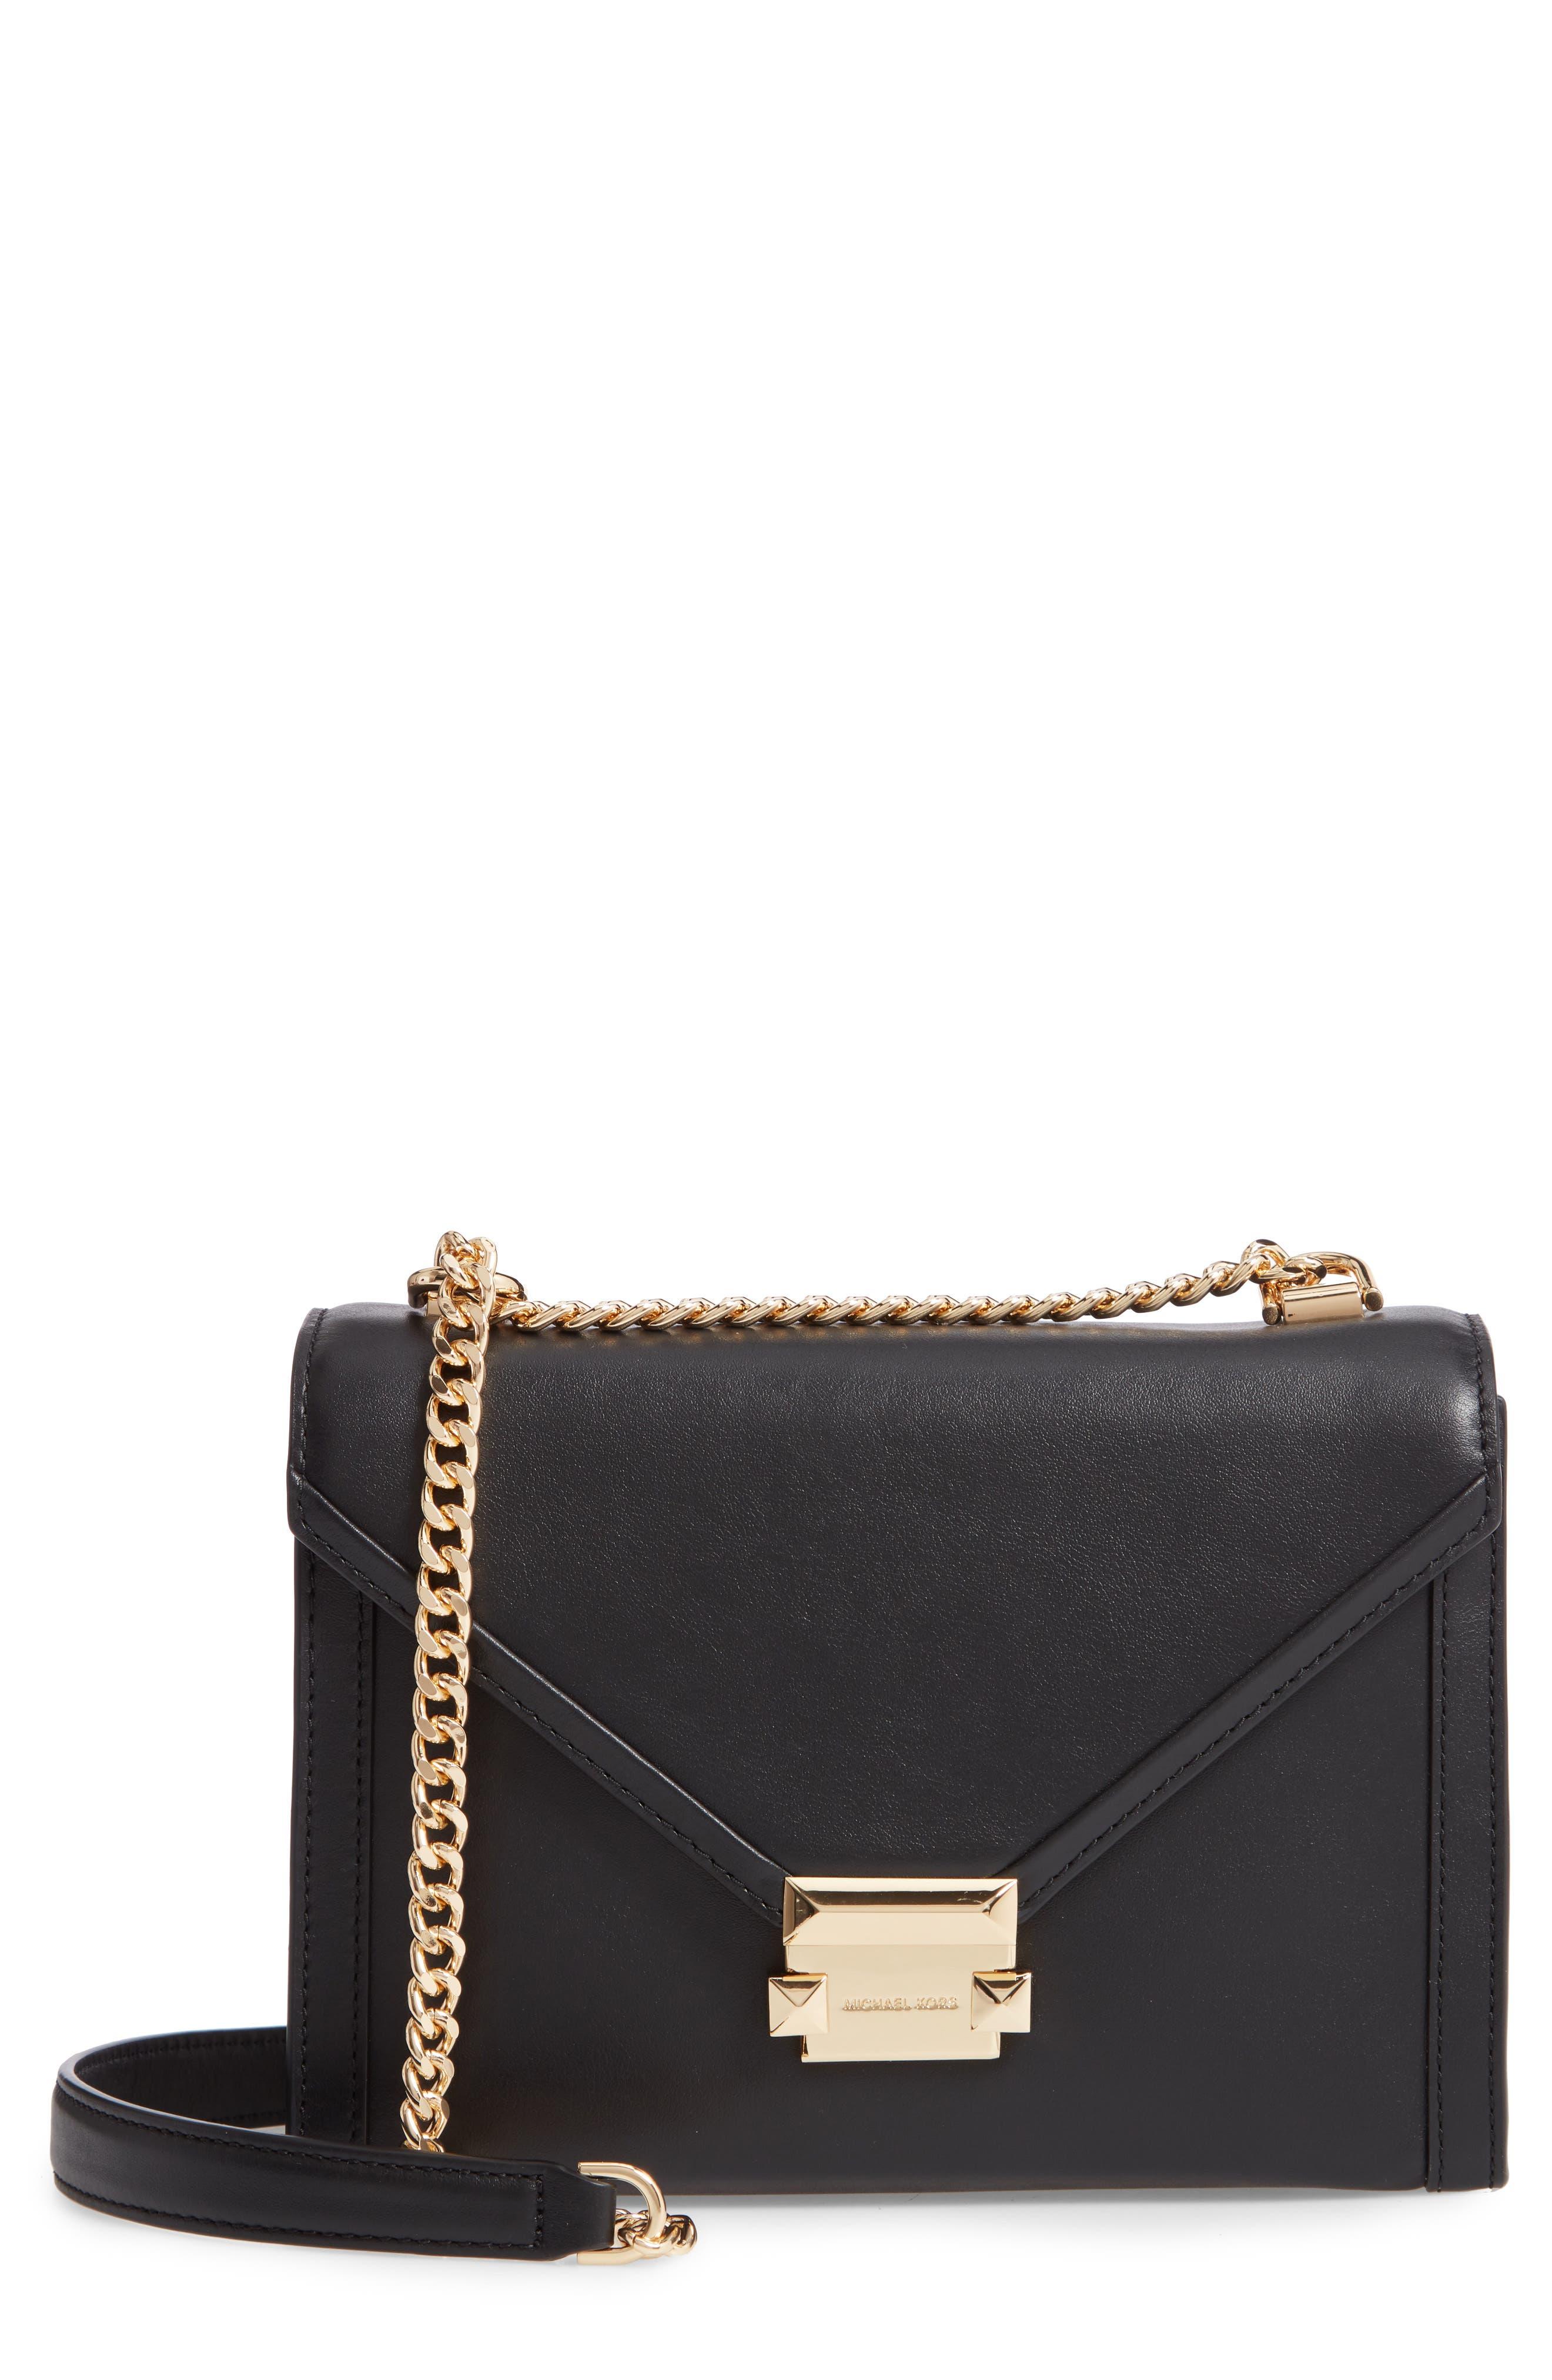 MICHAEL MICHAEL KORS,                             Large Whitney Leather Shoulder Bag,                             Main thumbnail 1, color,                             BLACK